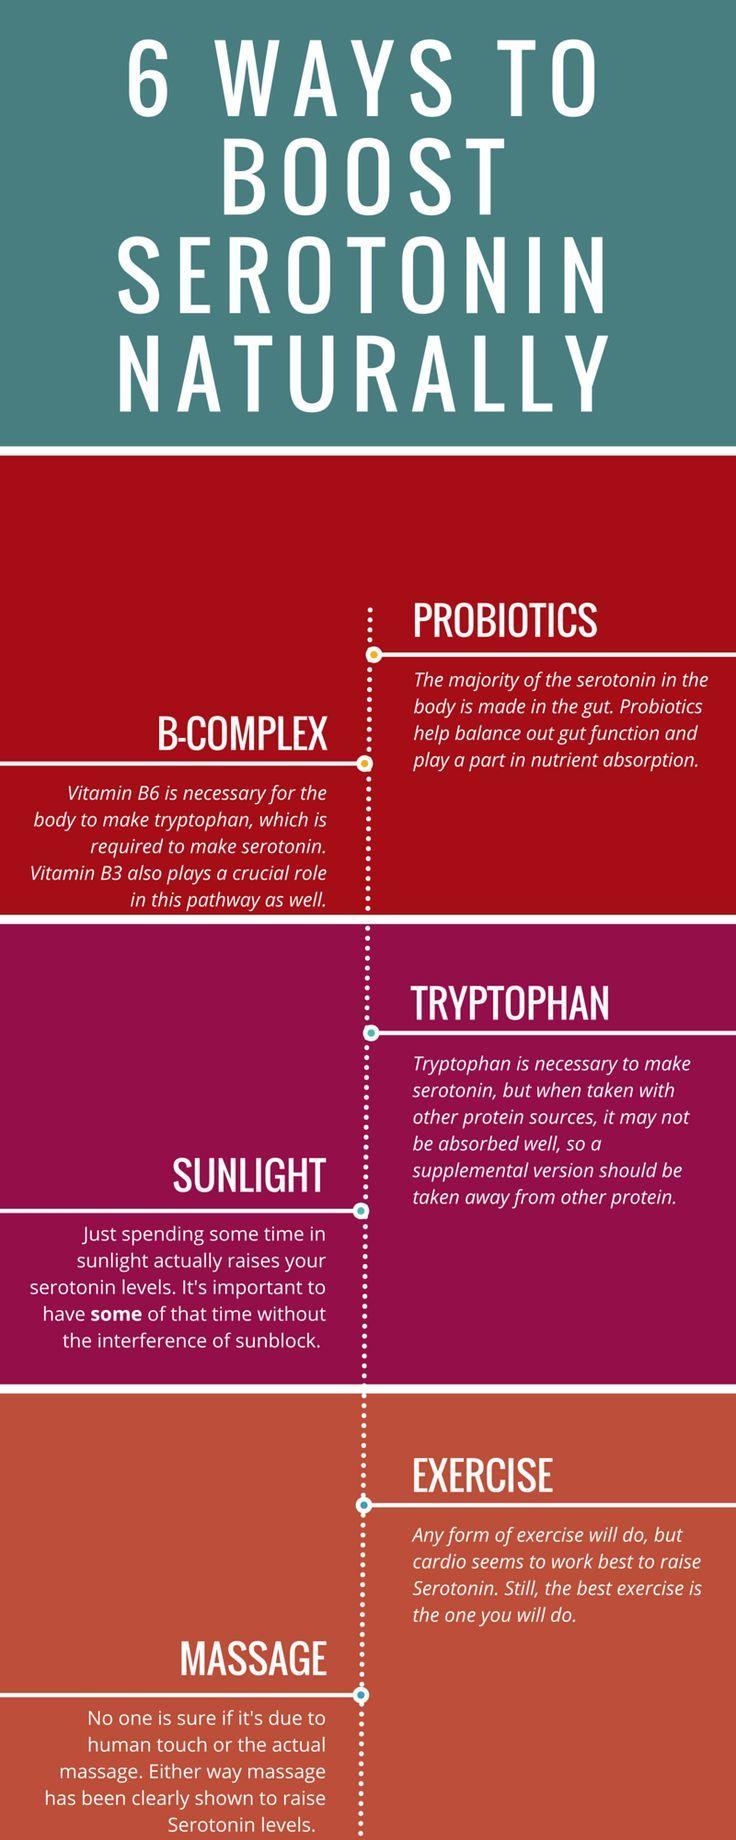 6 ways to naturally boost serotonin (2) health pinterest6 ways to naturally boost serotonin (2)